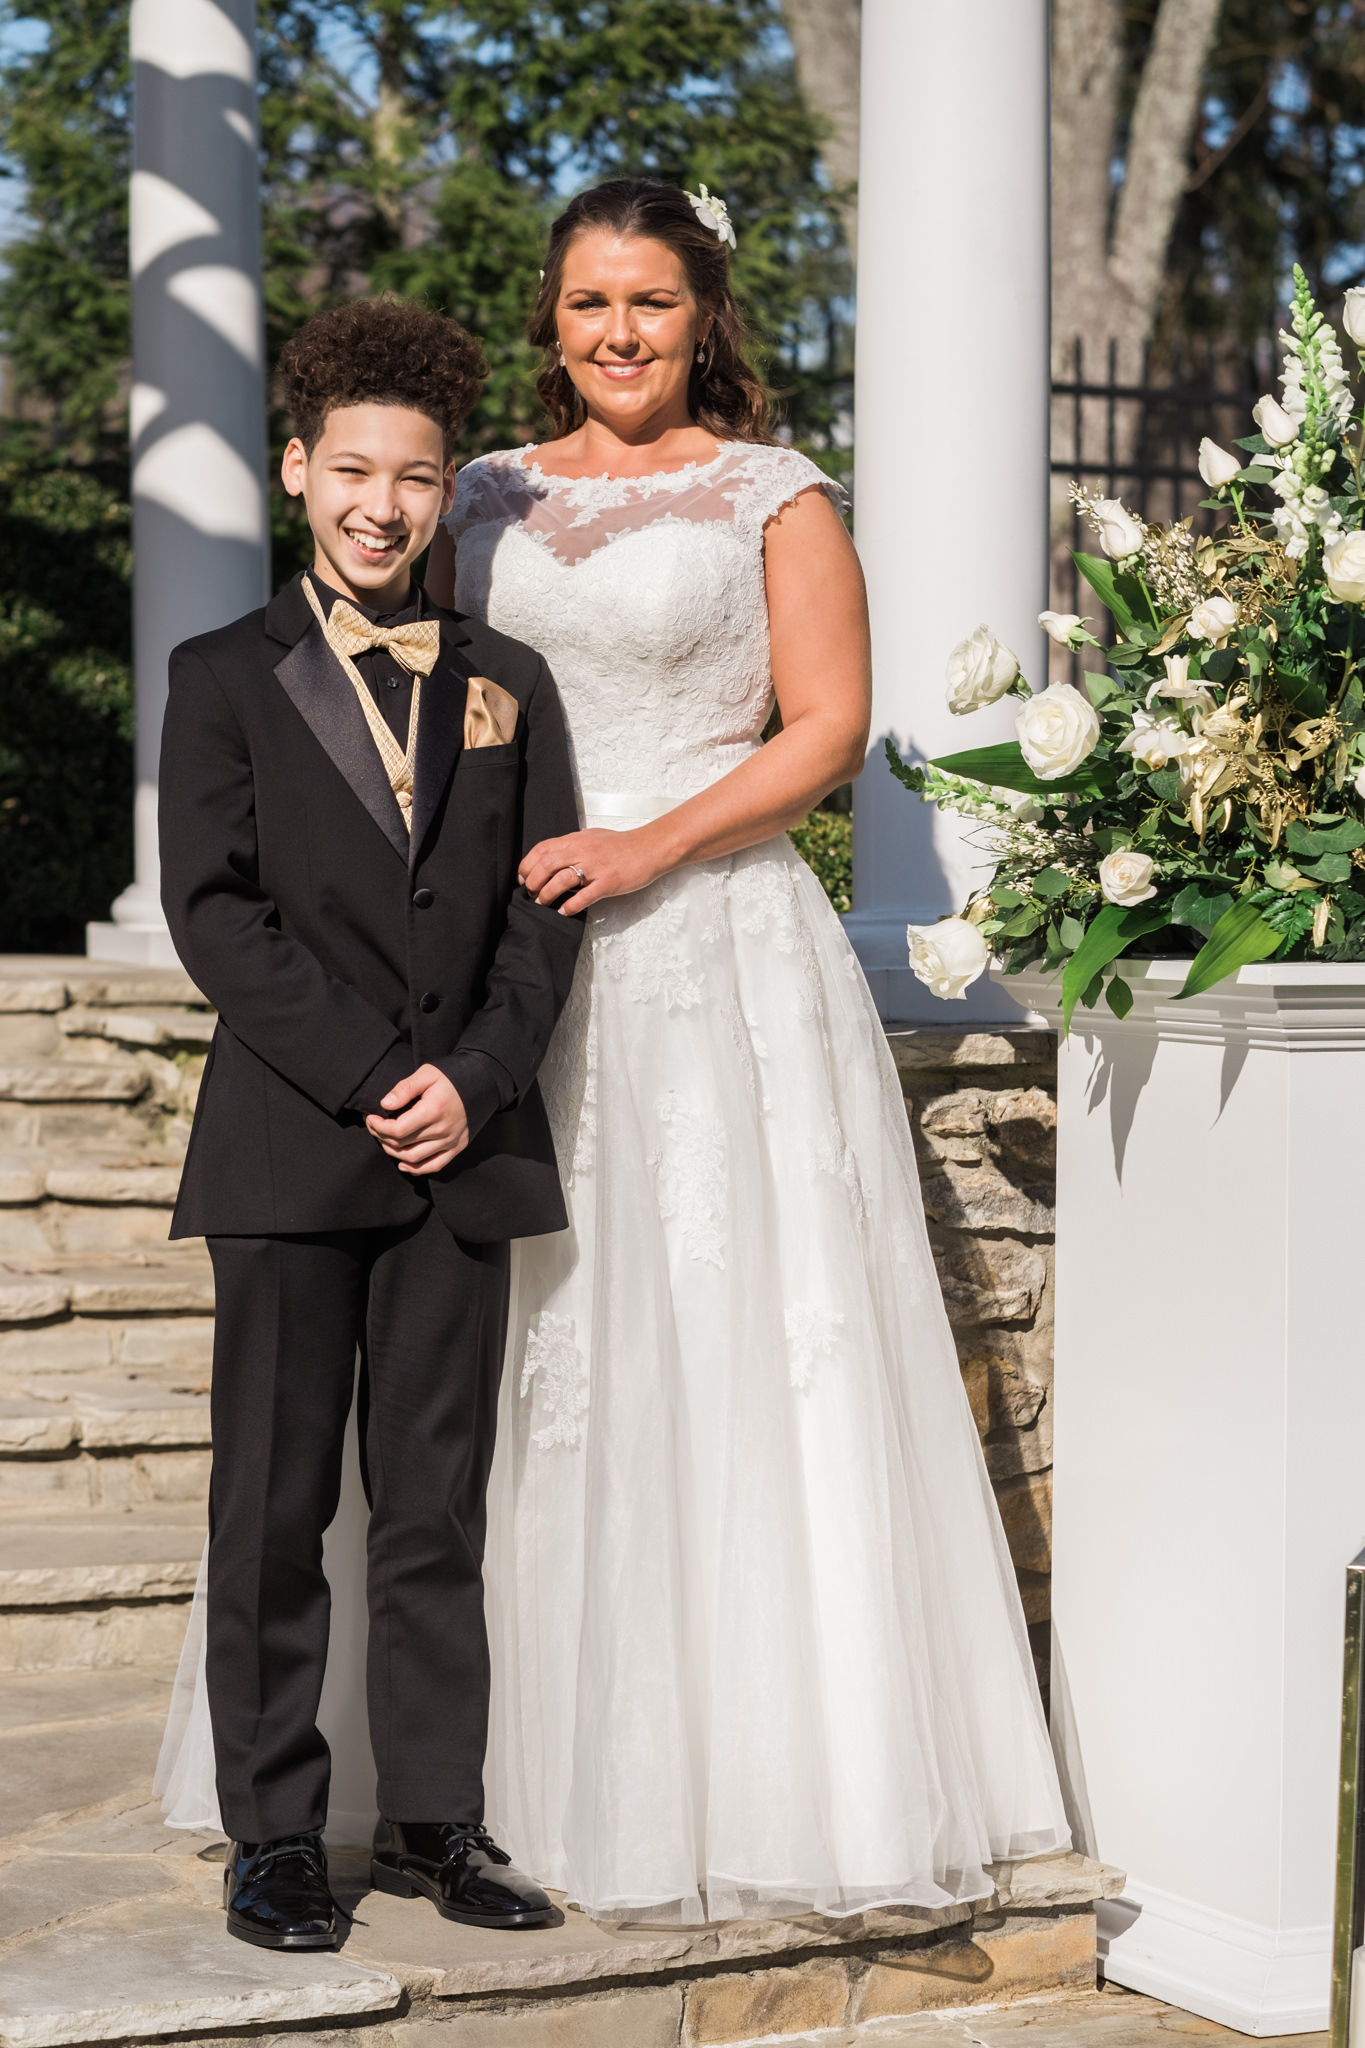 Amanda&Johnathan_Wedding_Blog_0008.jpg